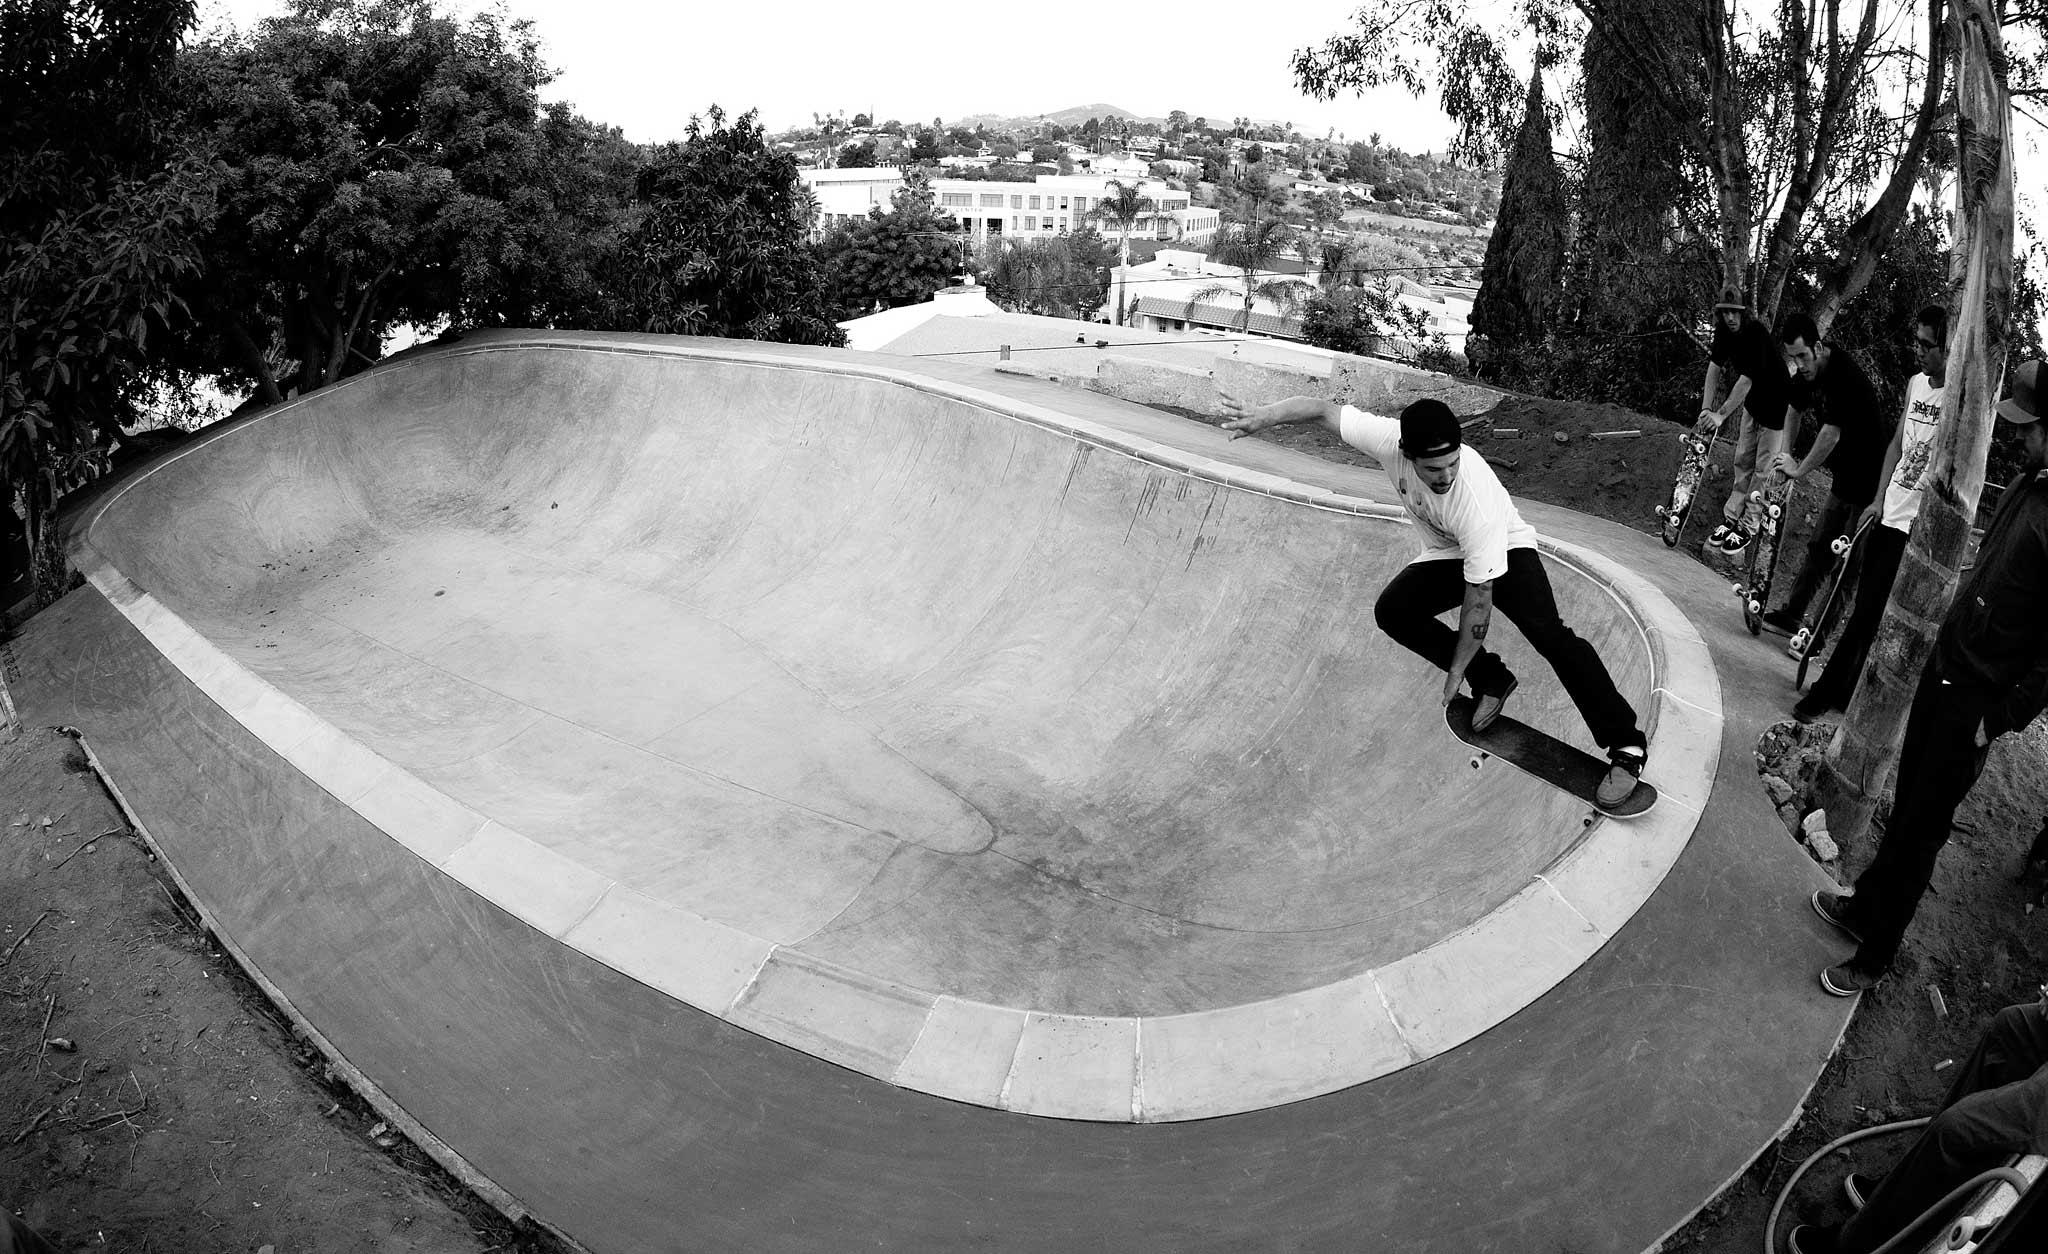 Jordan Hoffart, Crail Slide